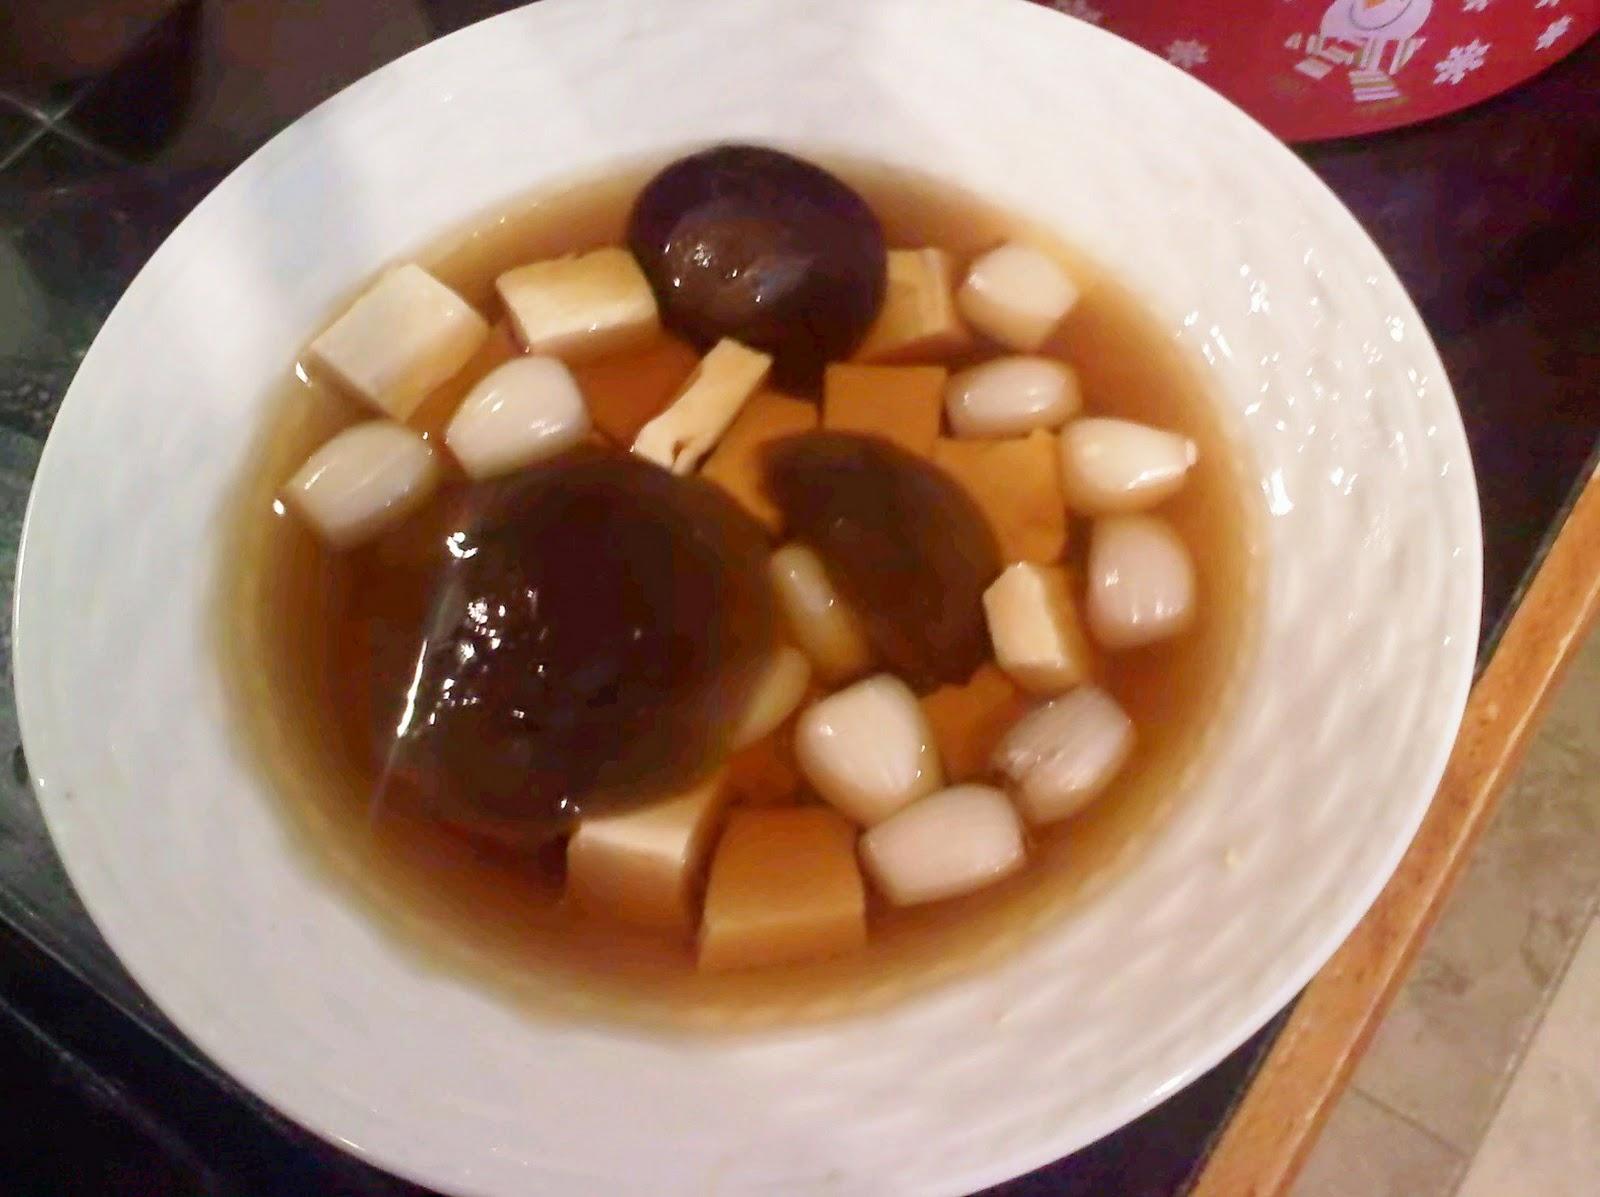 Tofu And Scallions In Mushroom Broth Recipes — Dishmaps